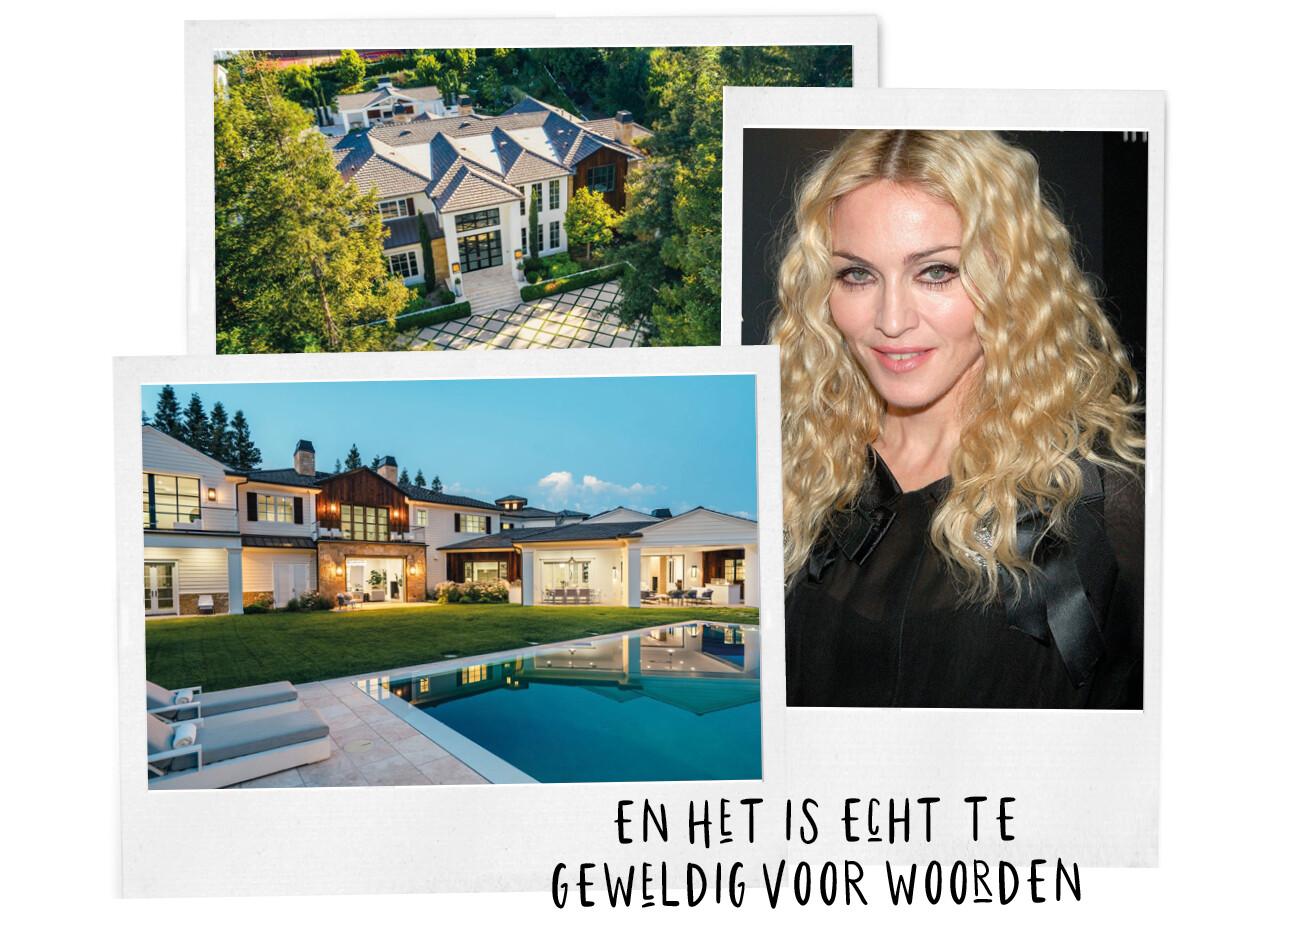 Madonna nieuwe huis gekocht van The Weeknd